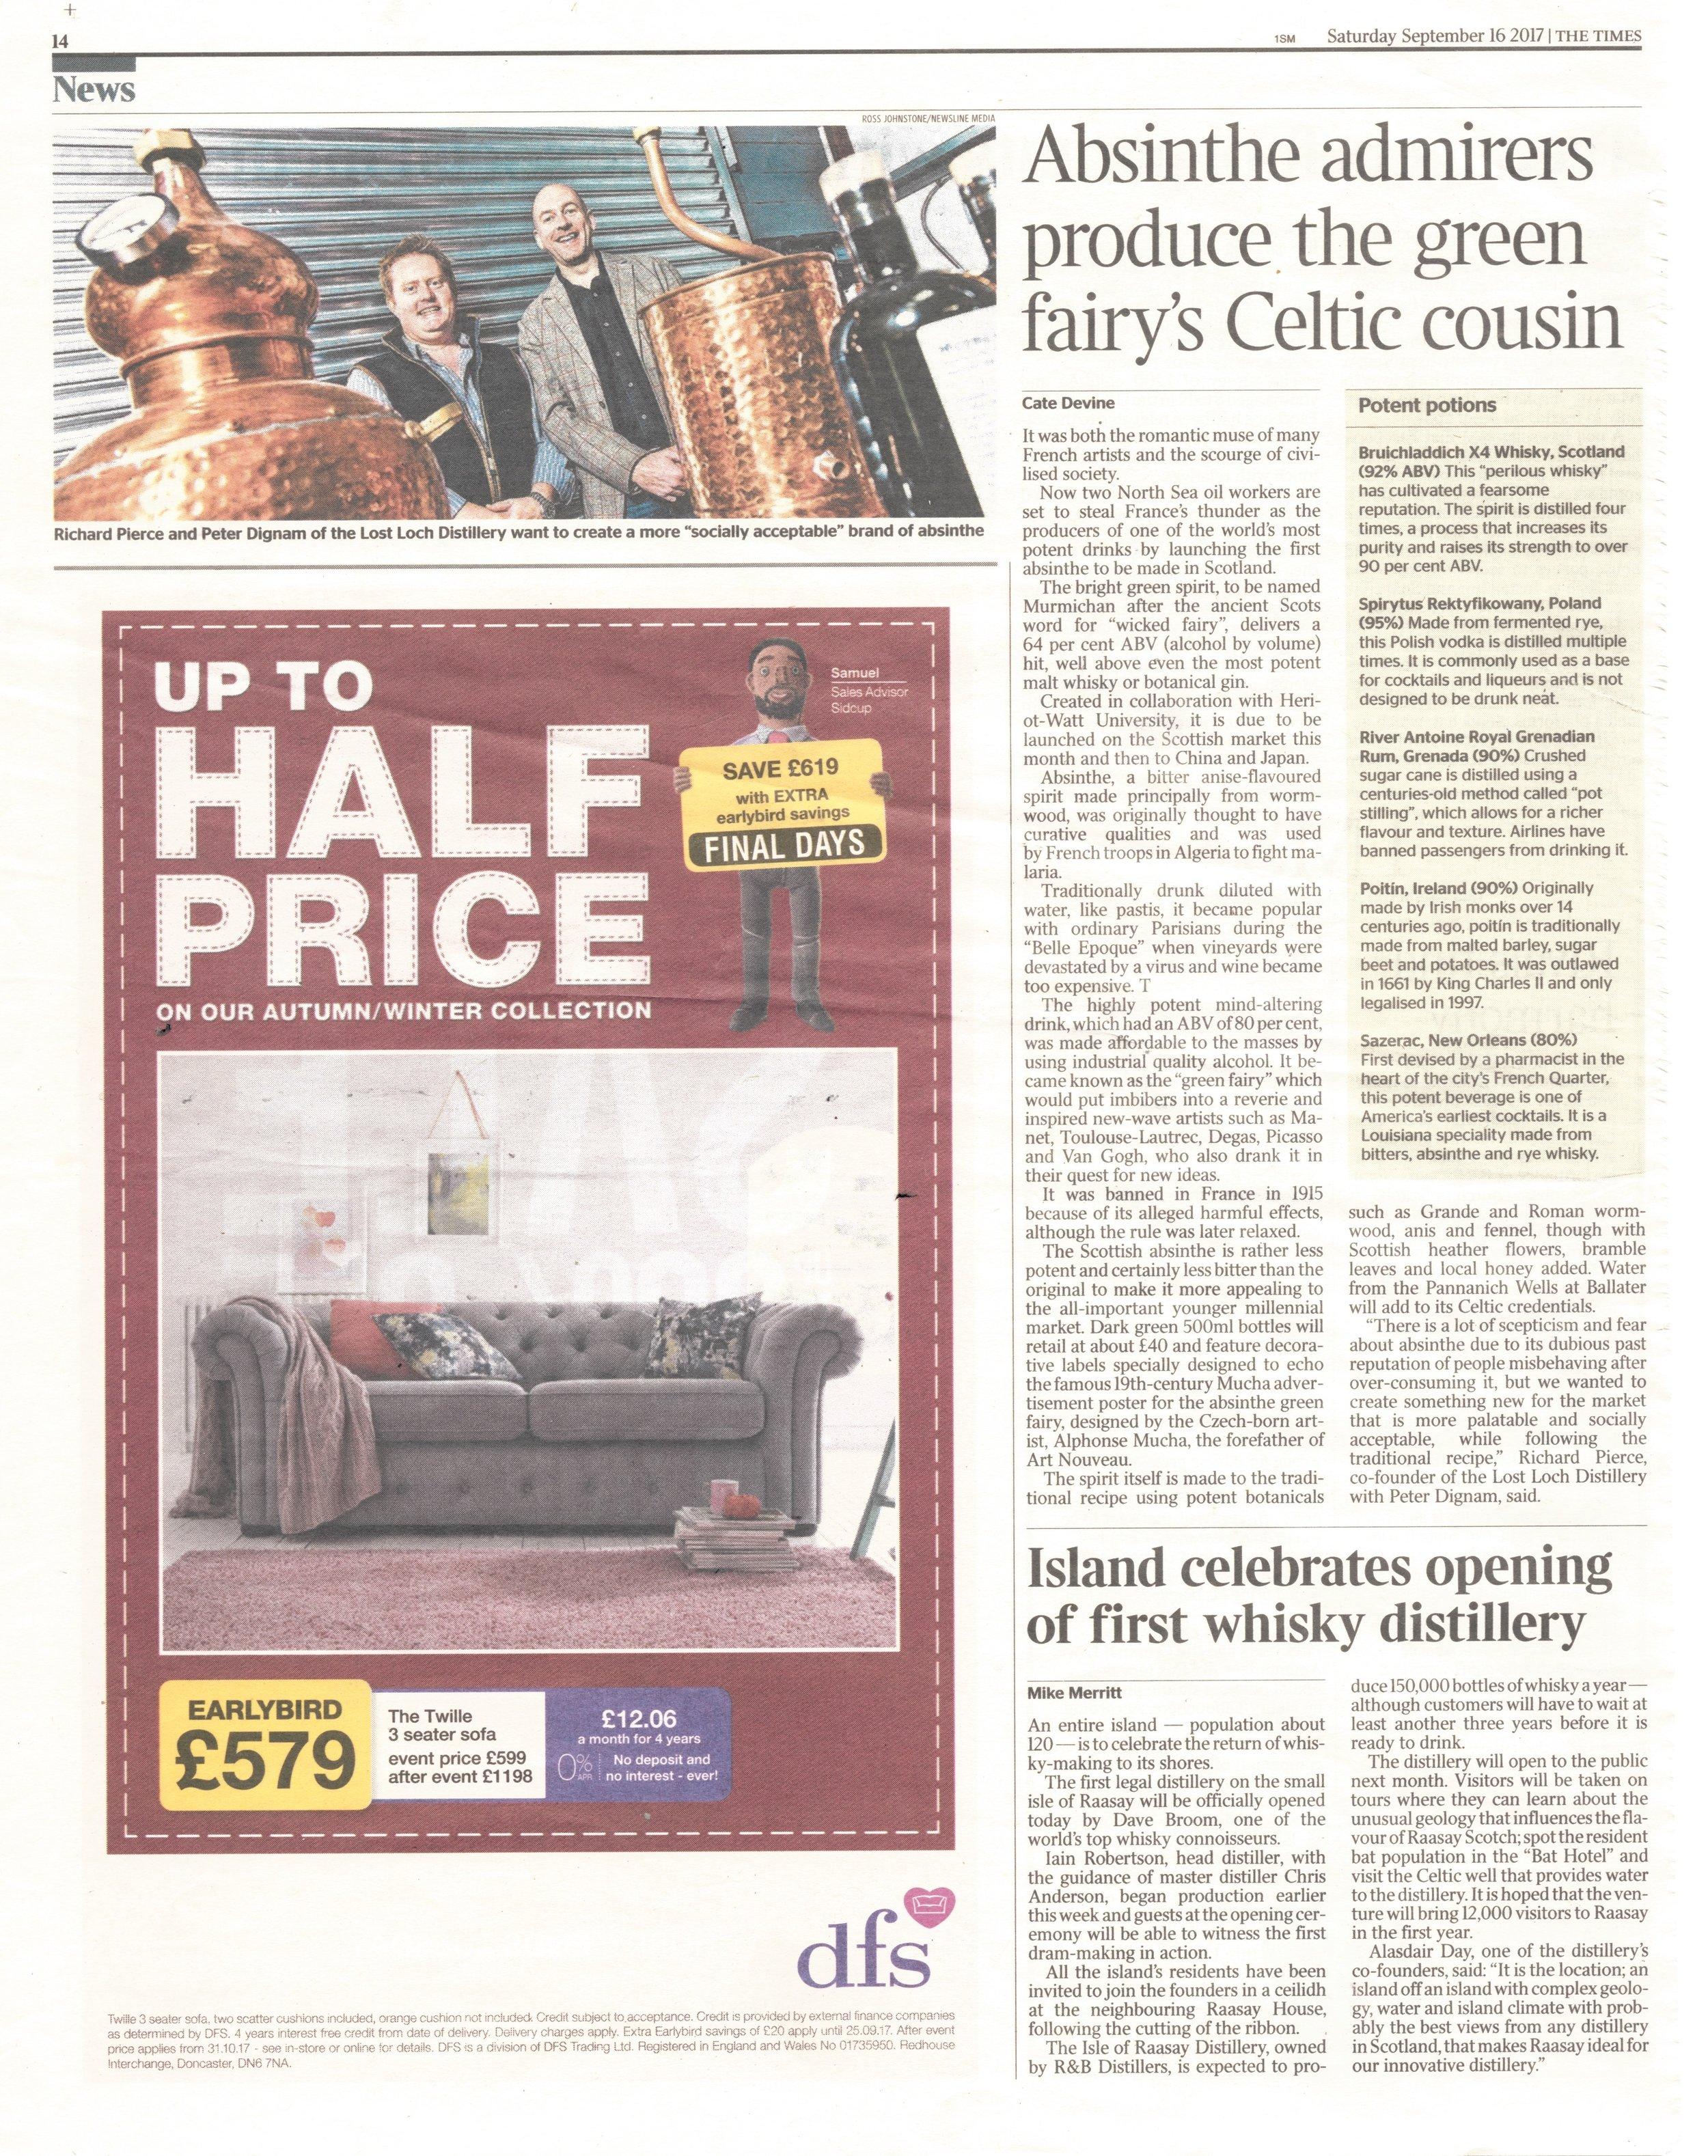 The Times Scotland - Feature - 16 Sept 2017.jpeg